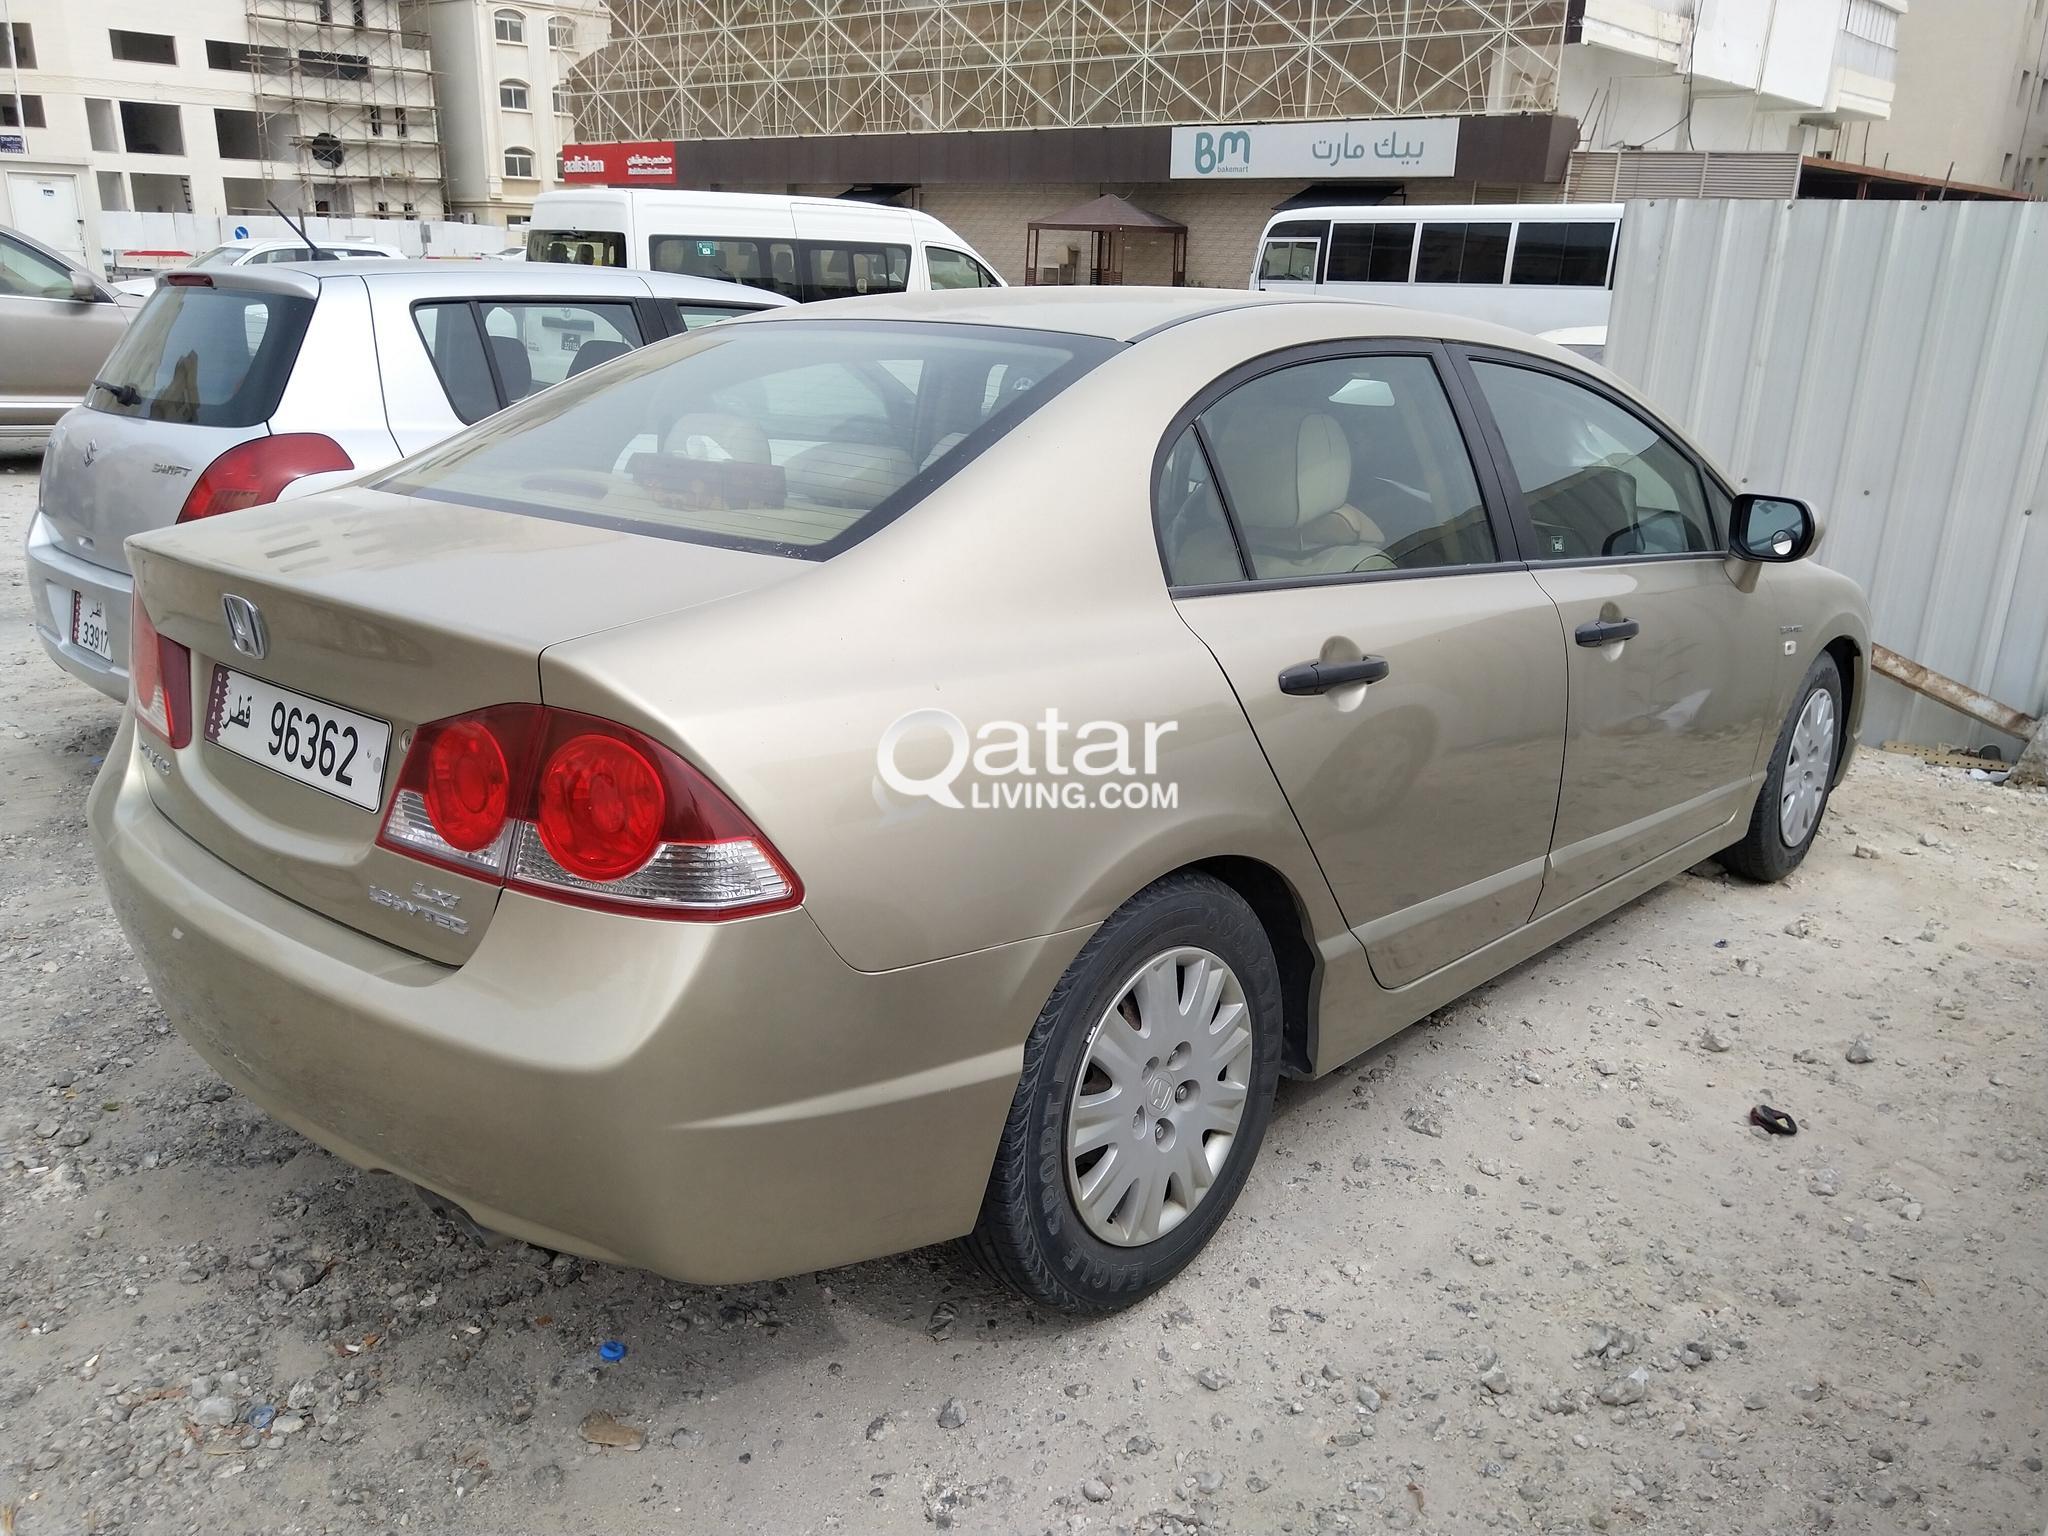 Honda Civic 2007 For Sale >> For Sale Honda Civic 2007 Qatar Living